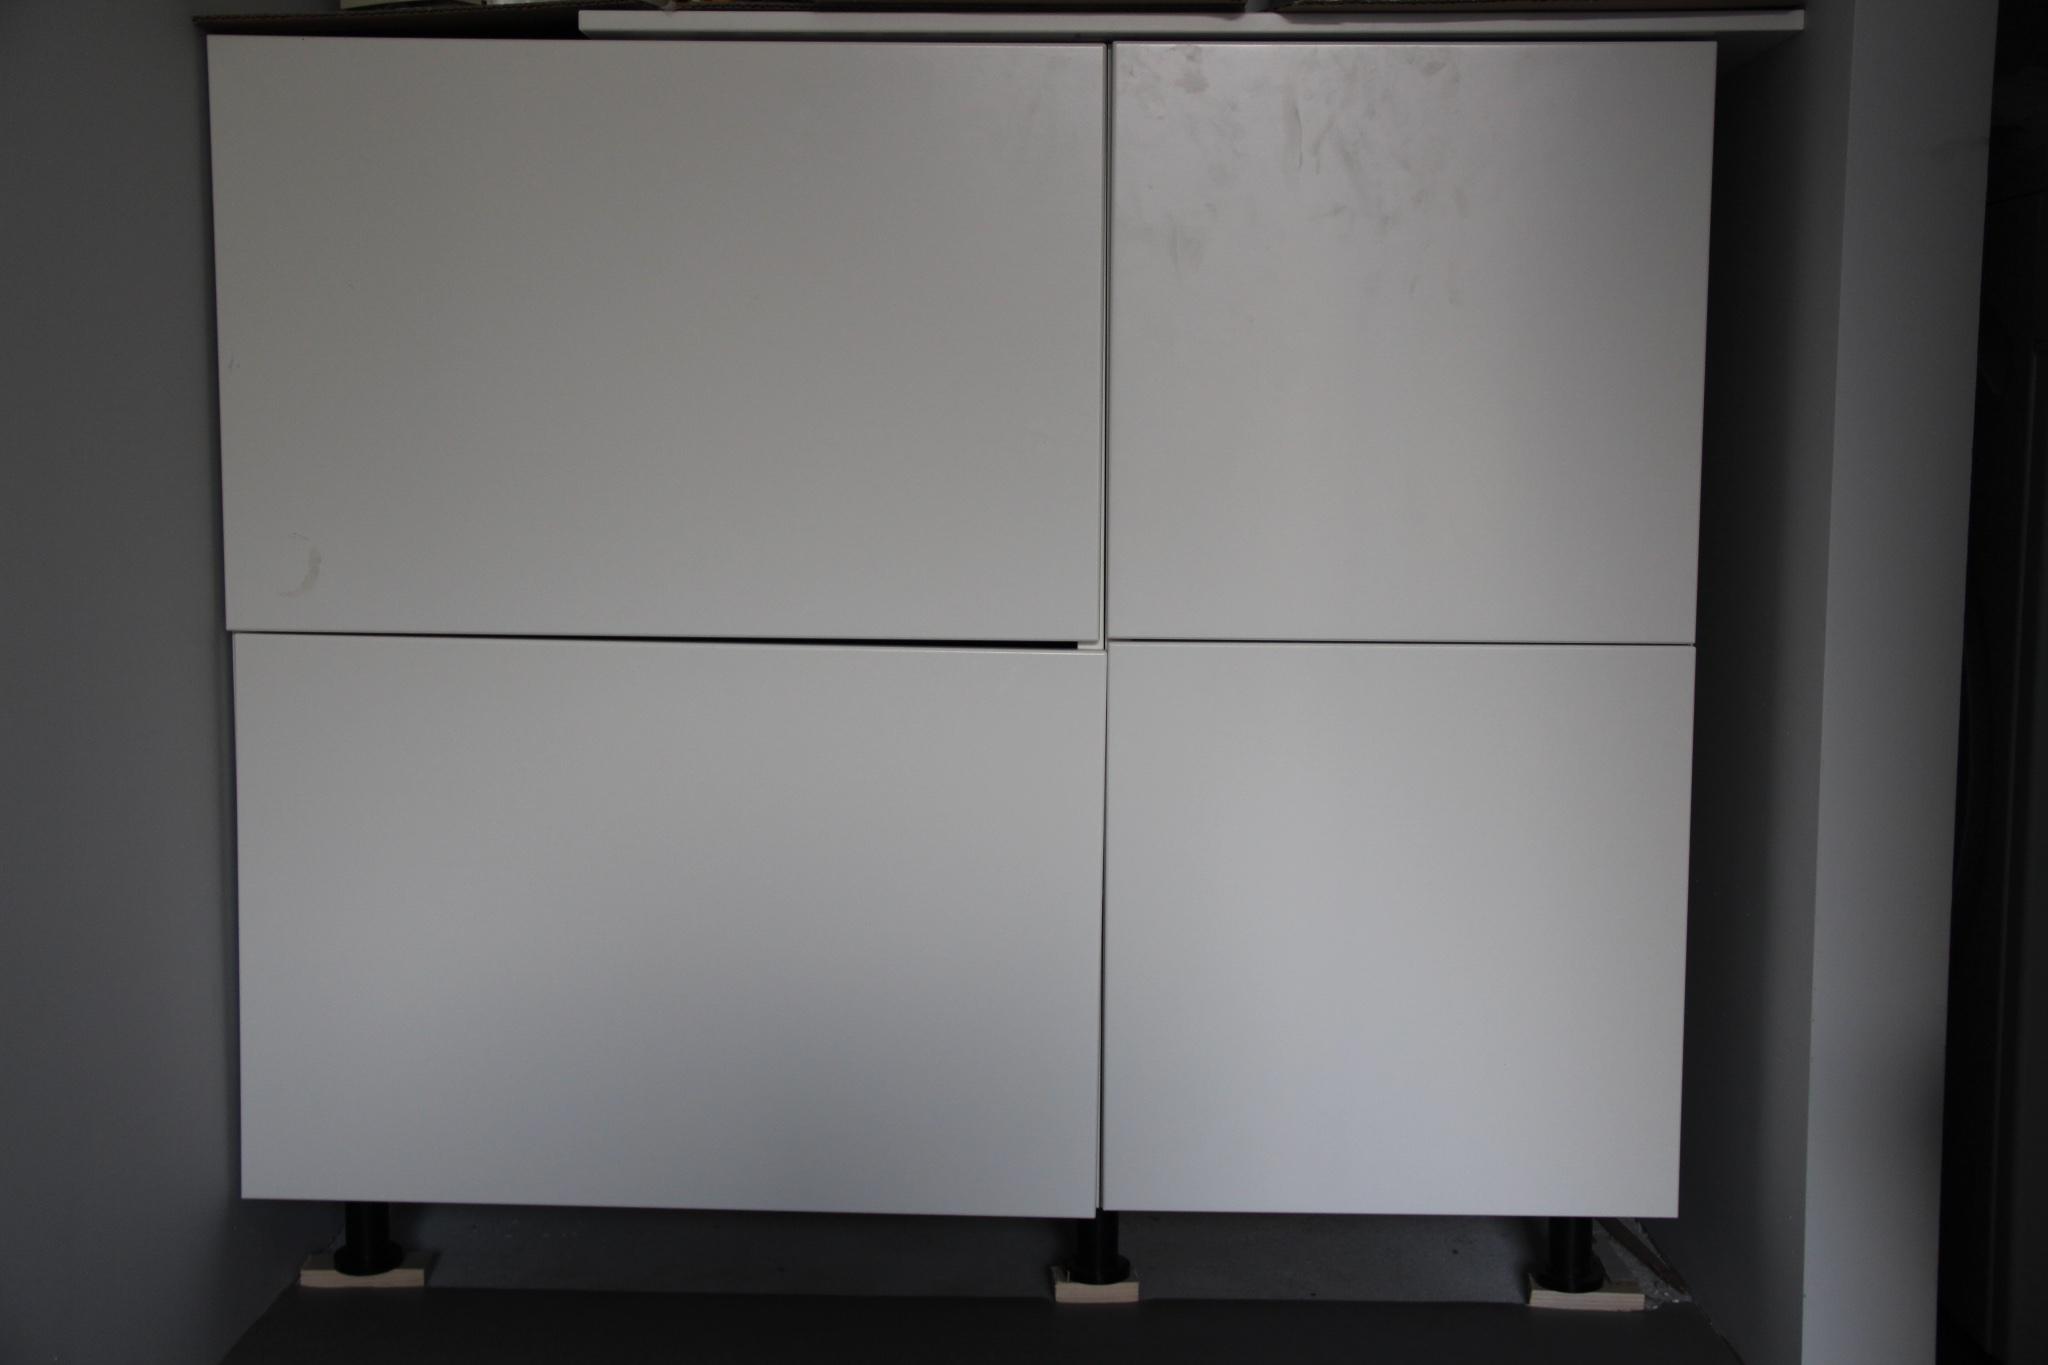 Klein Ikea Keukenblok Afmaken En Keukenblad Zagen Werkspot